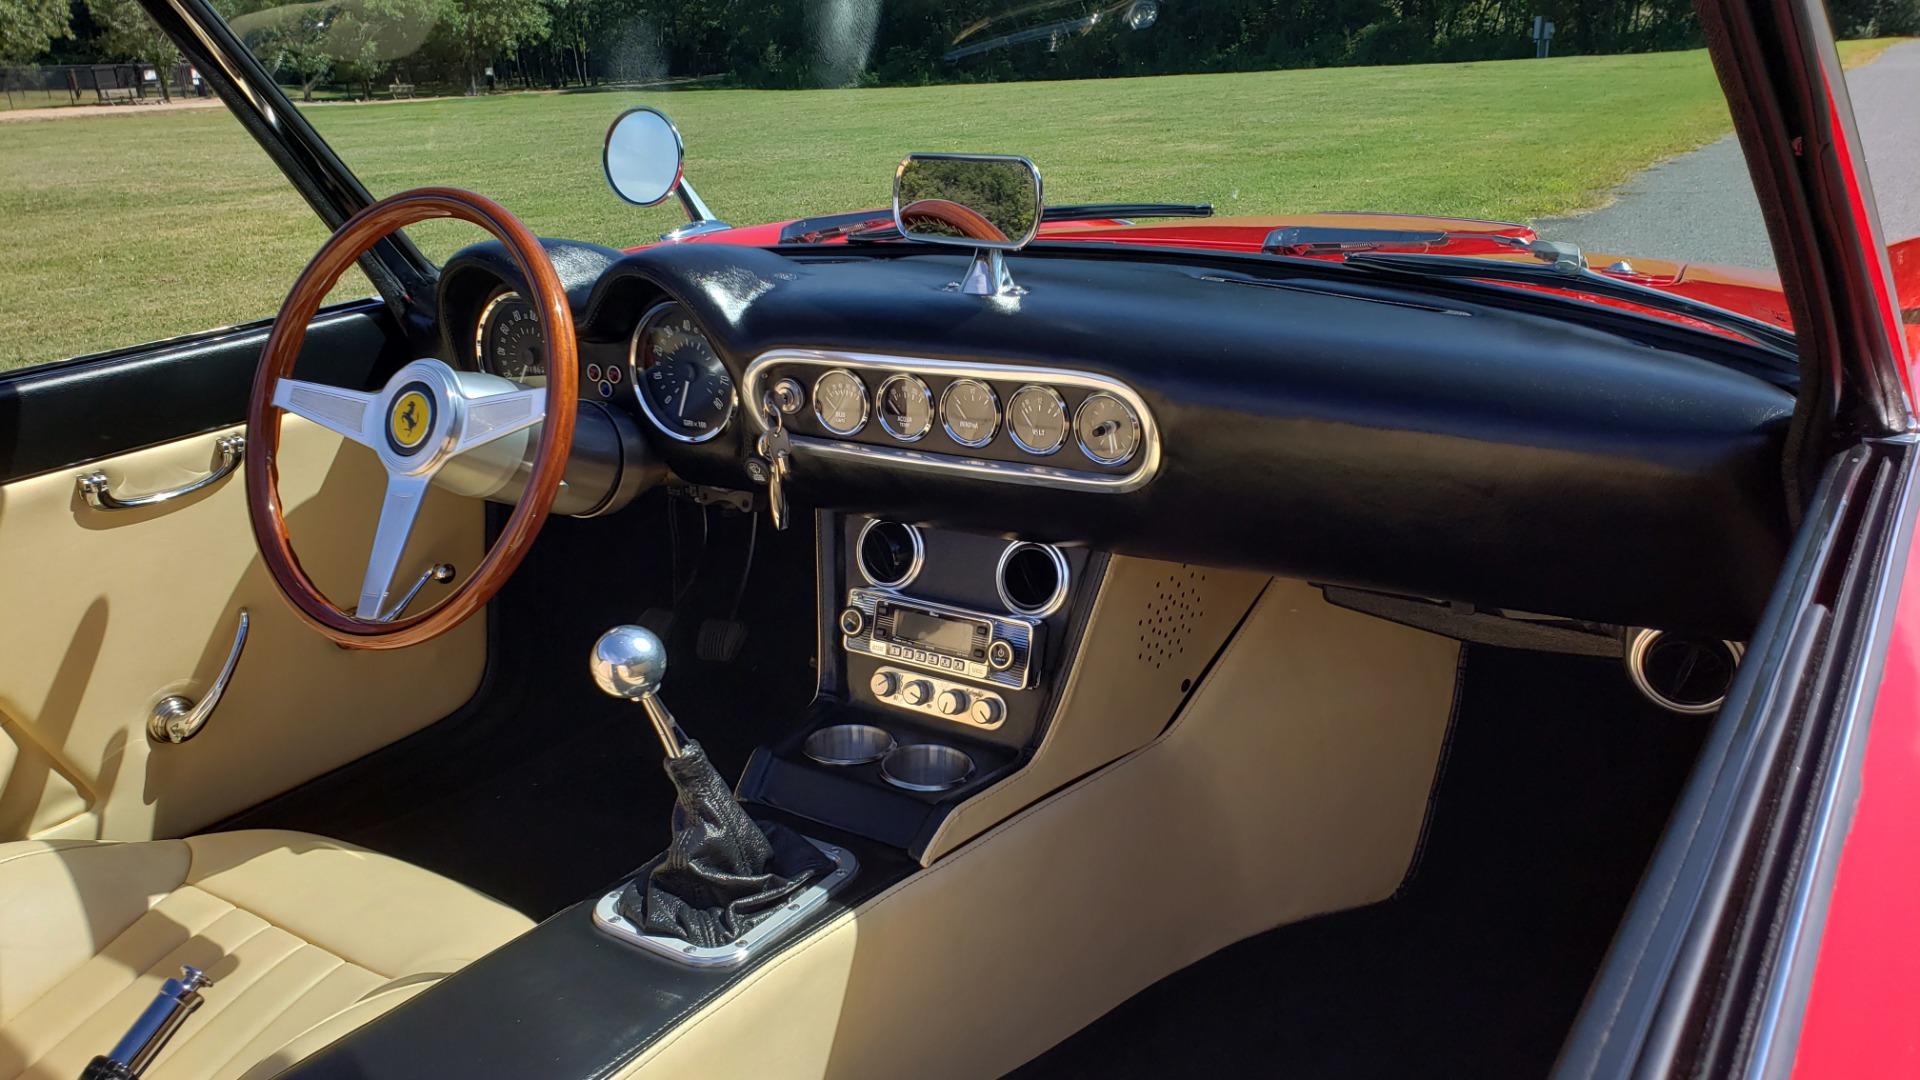 Used 1961 Ferrari 250GT SWB CALIFORNIA REPLICA / 302CI V8 / TREMEC 5-SPEED for sale Sold at Formula Imports in Charlotte NC 28227 30